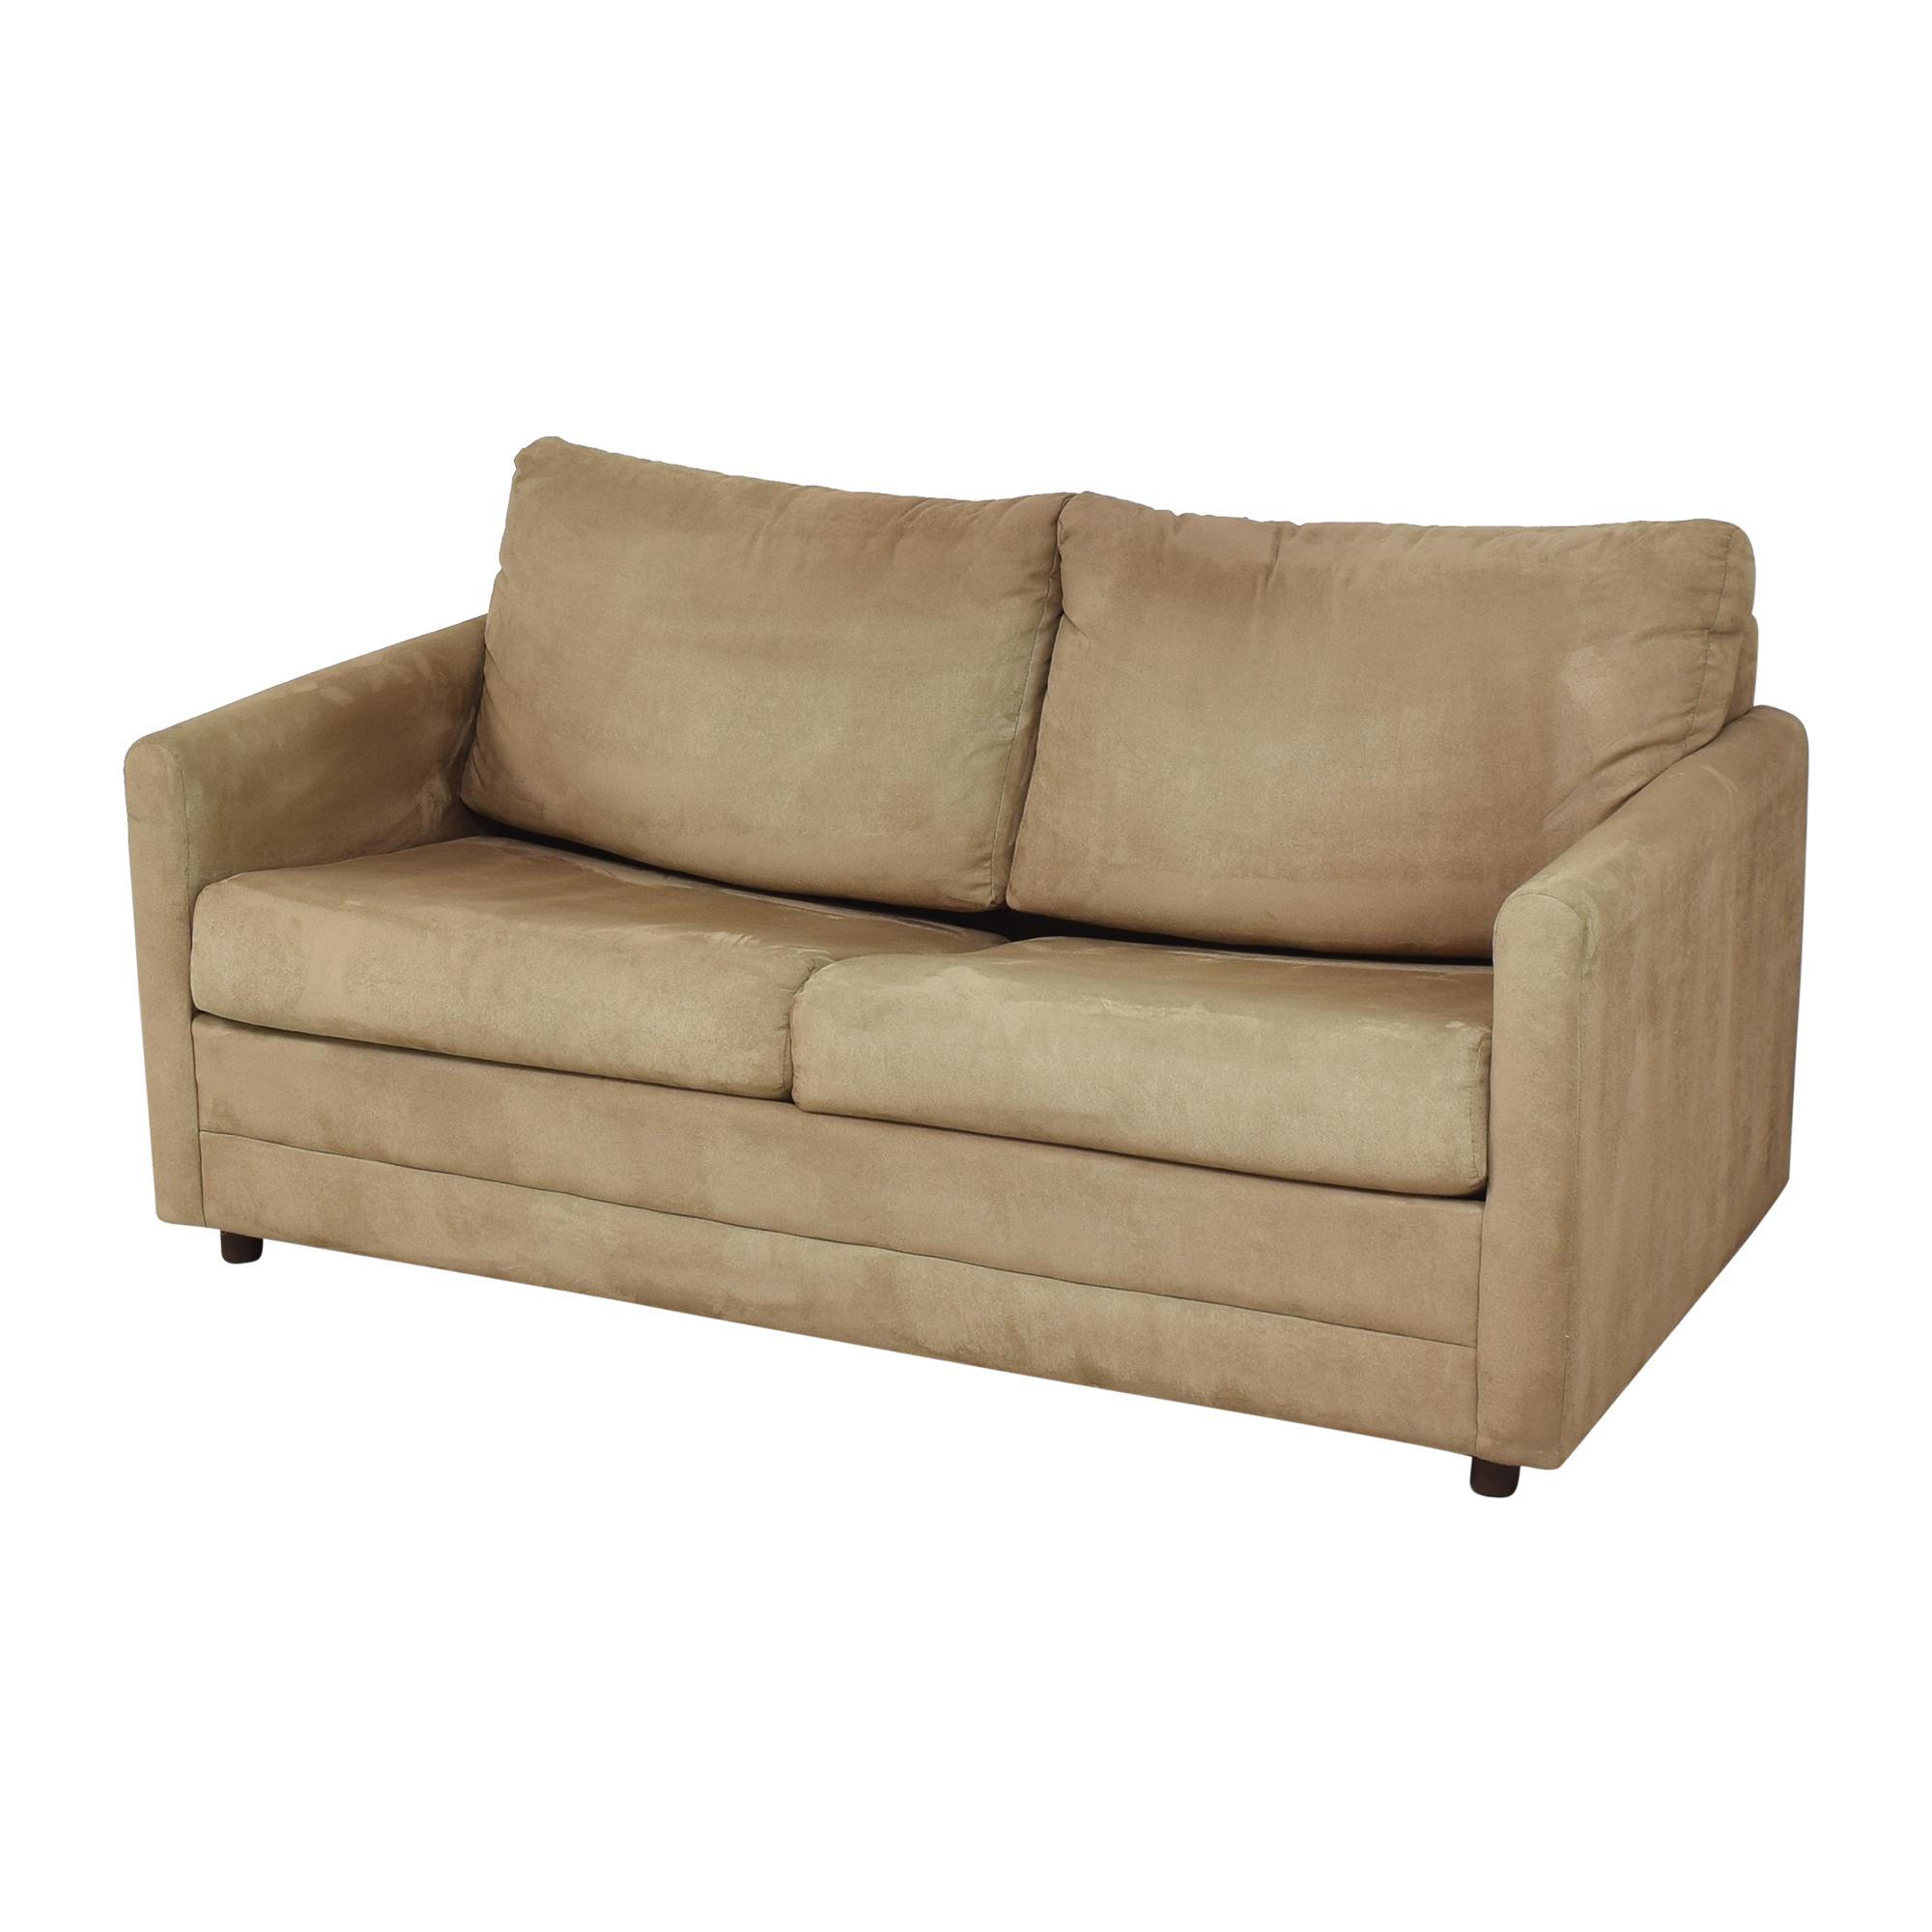 LaCrosse Furniture Lacrosse Furniture Two Cushion Sleeper Loveseat